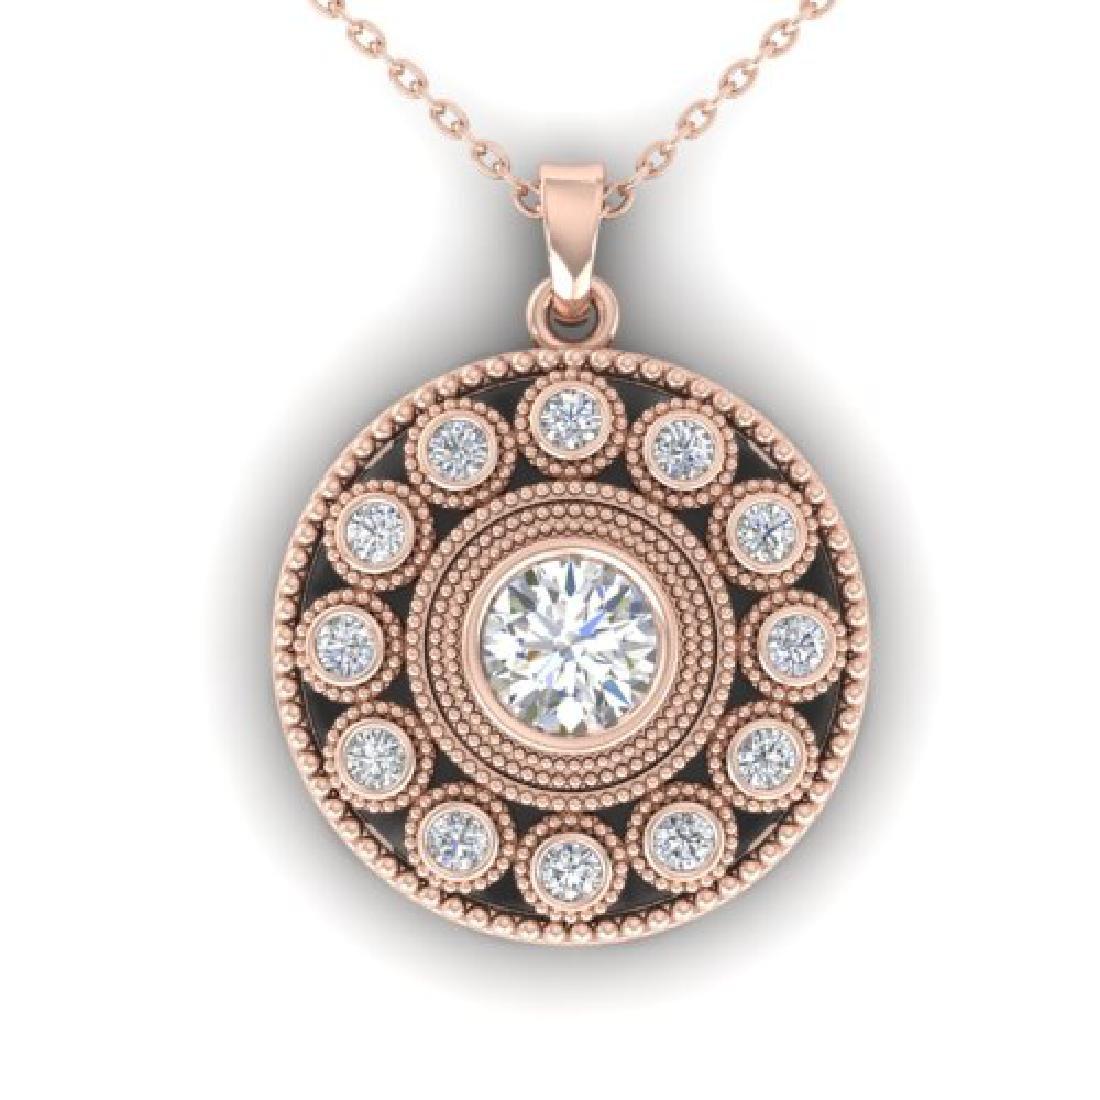 0.91 CTW Certified VS/SI Diamond Art Deco Necklace 18K